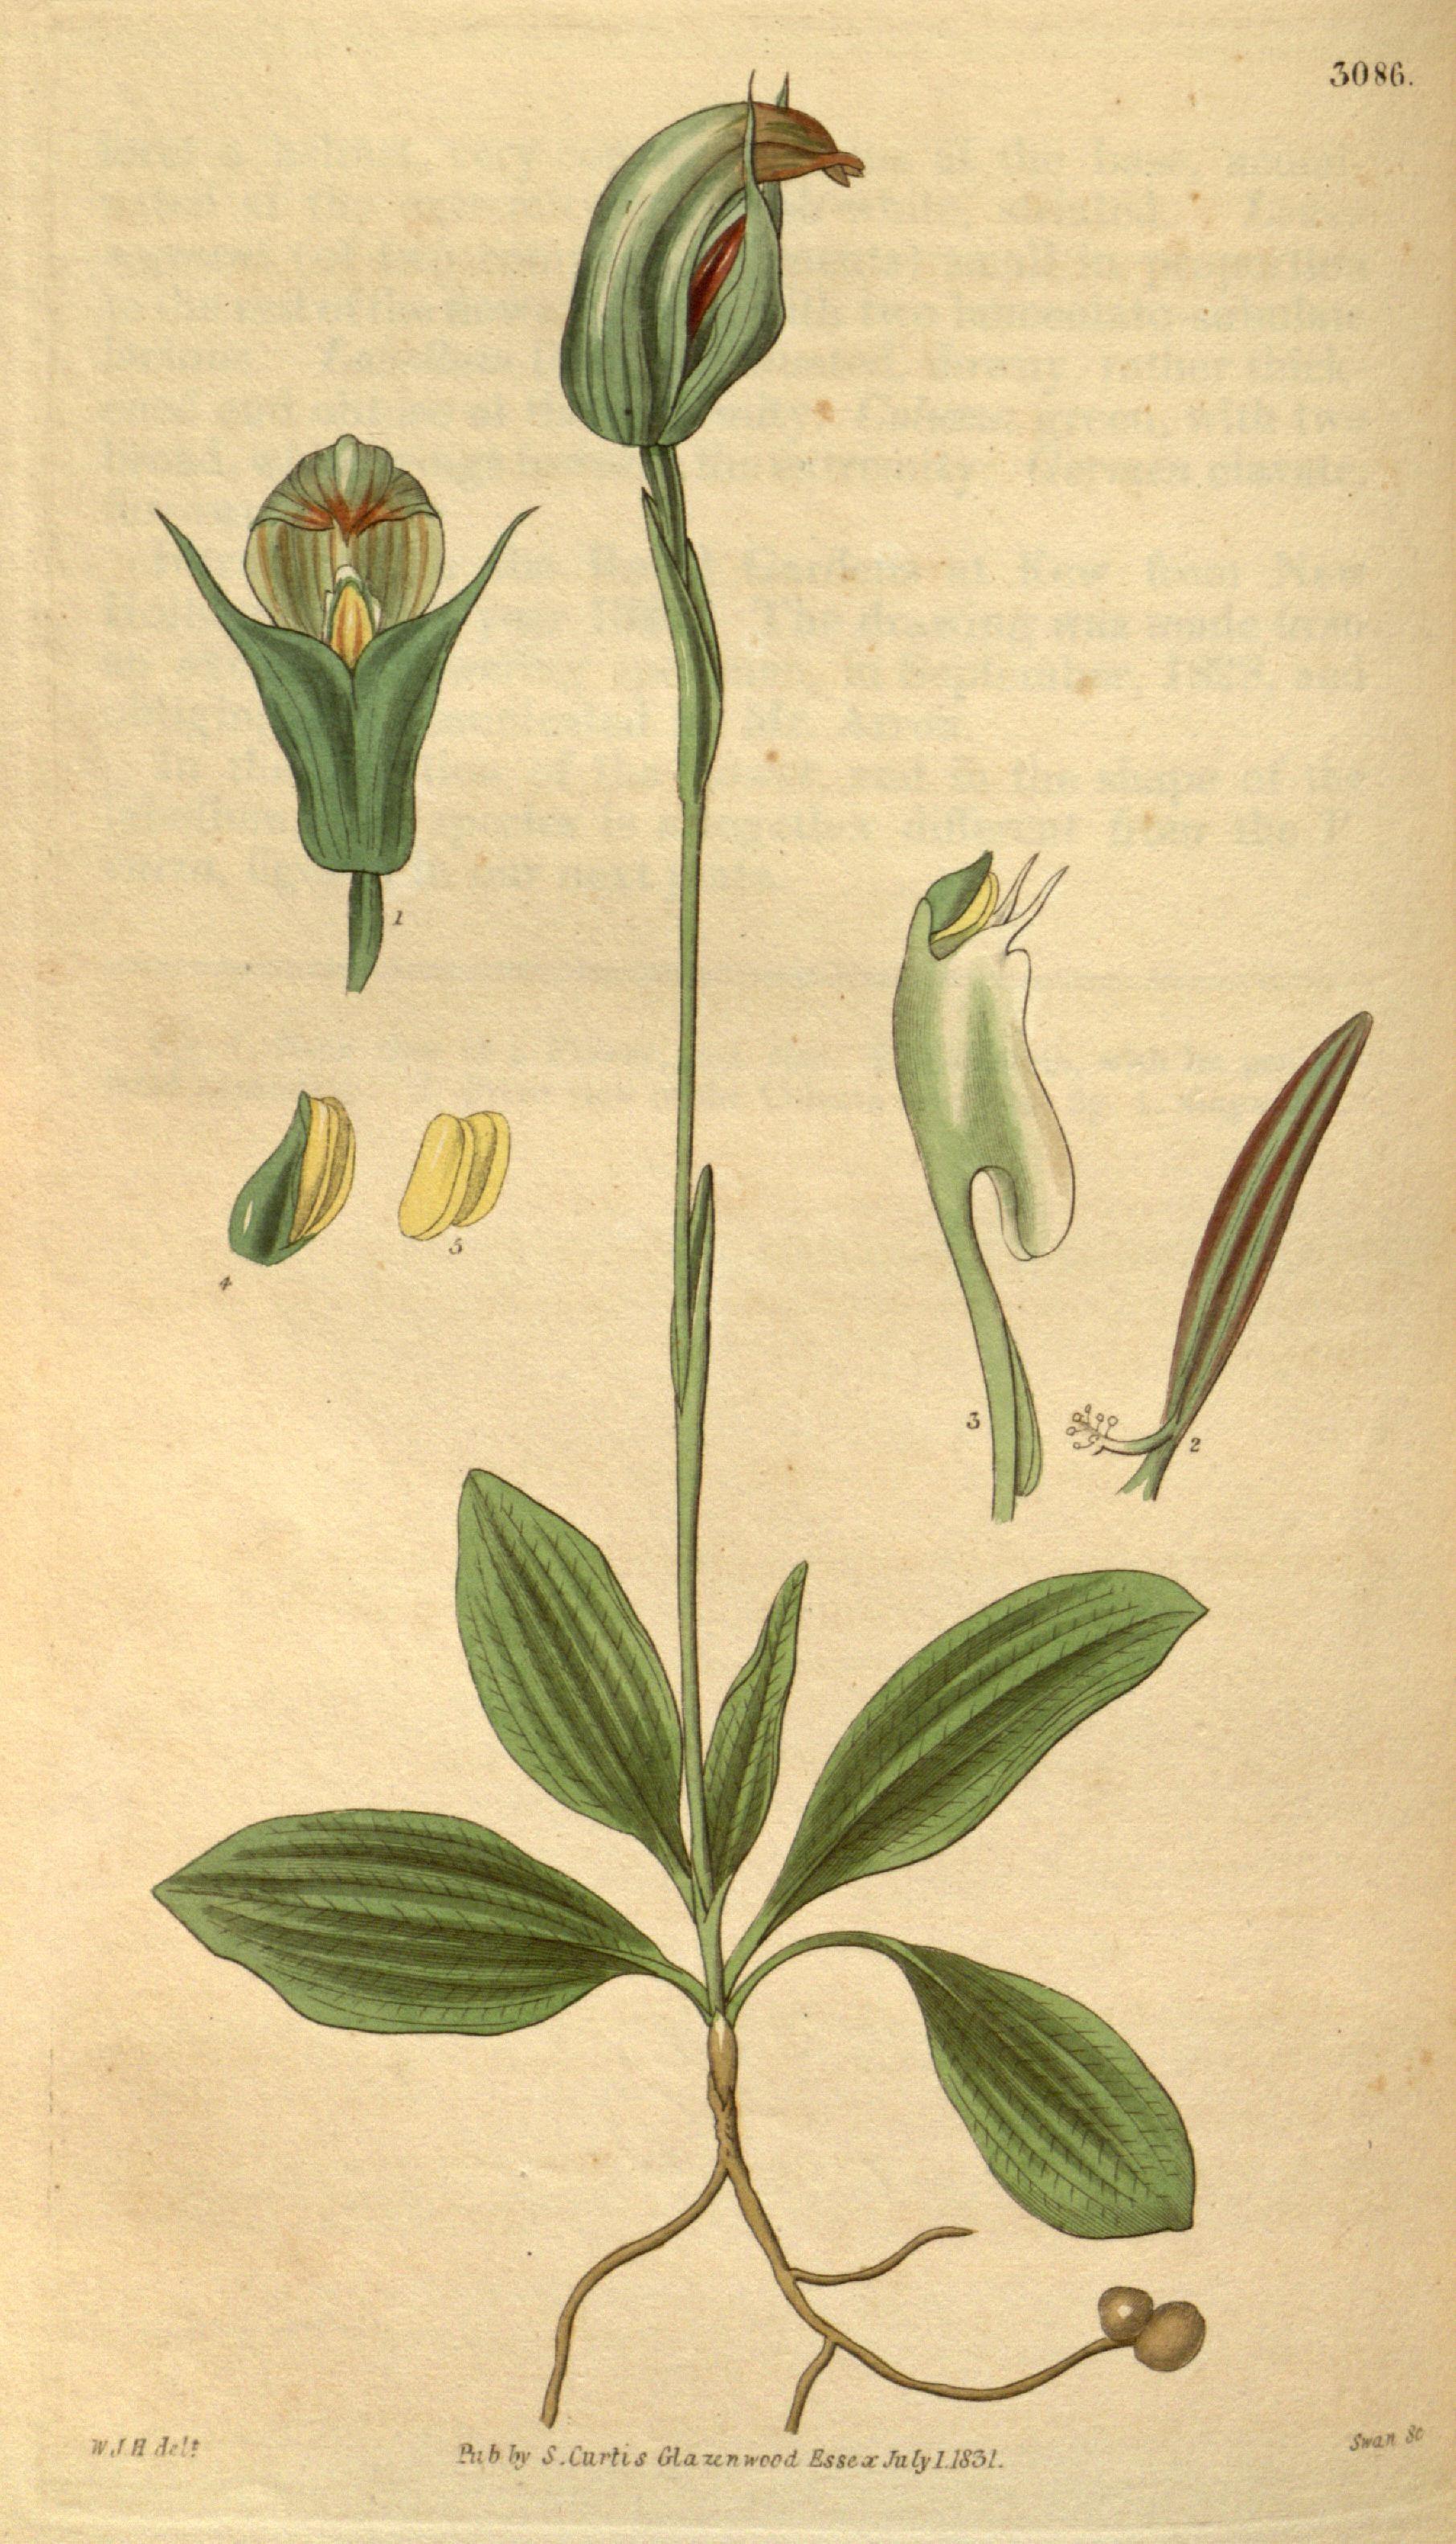 Image of Blunt greenhood